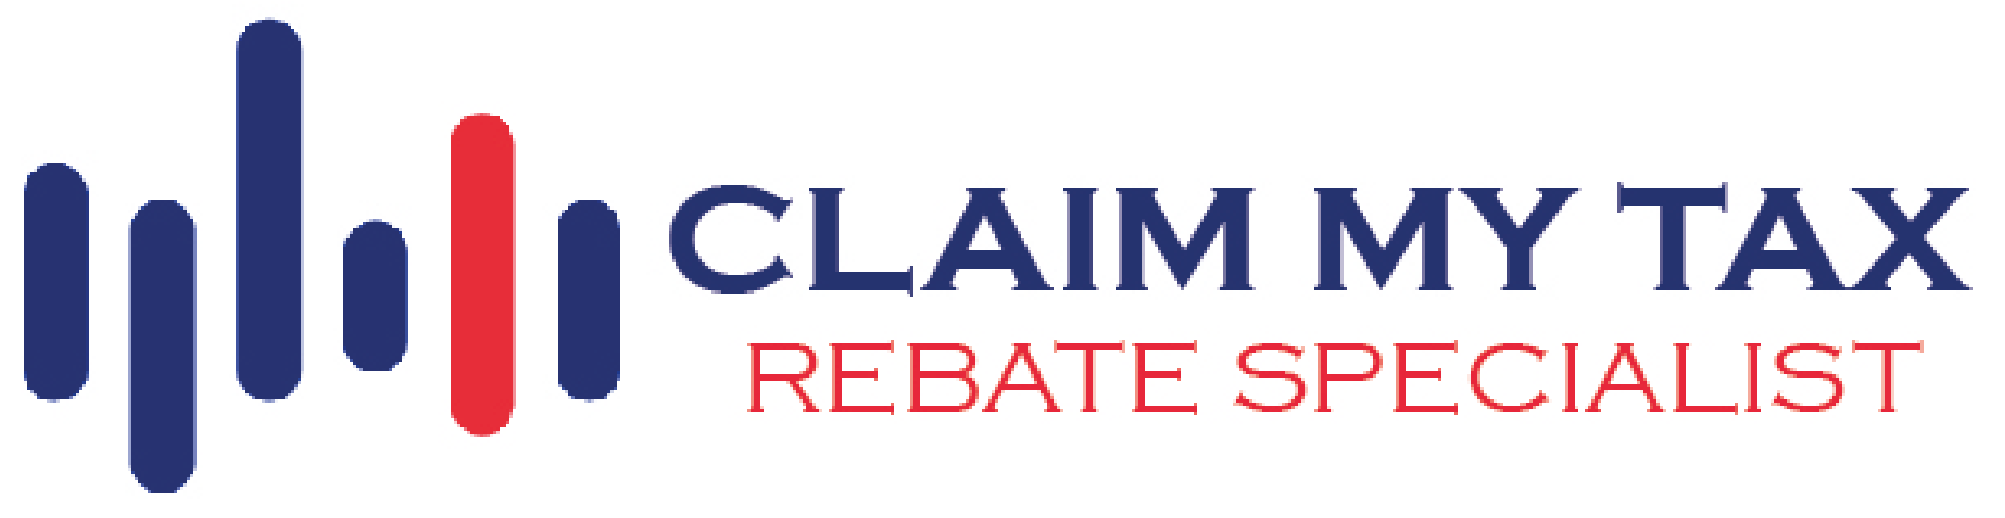 Claim My Tax